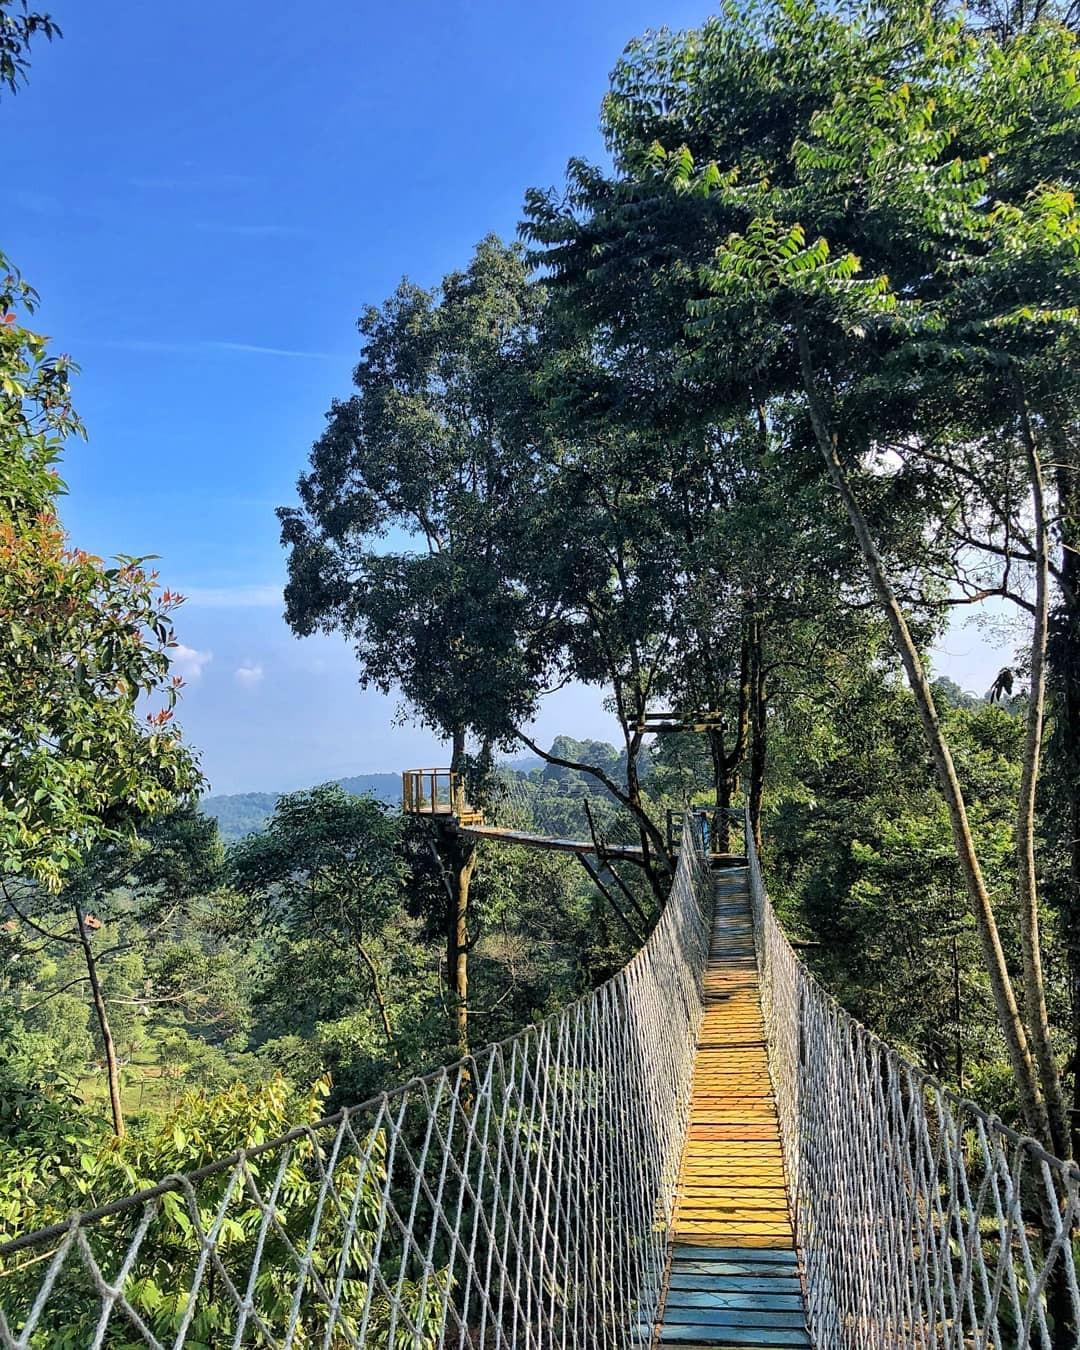 Ranggon Hills Bogor Indonesia